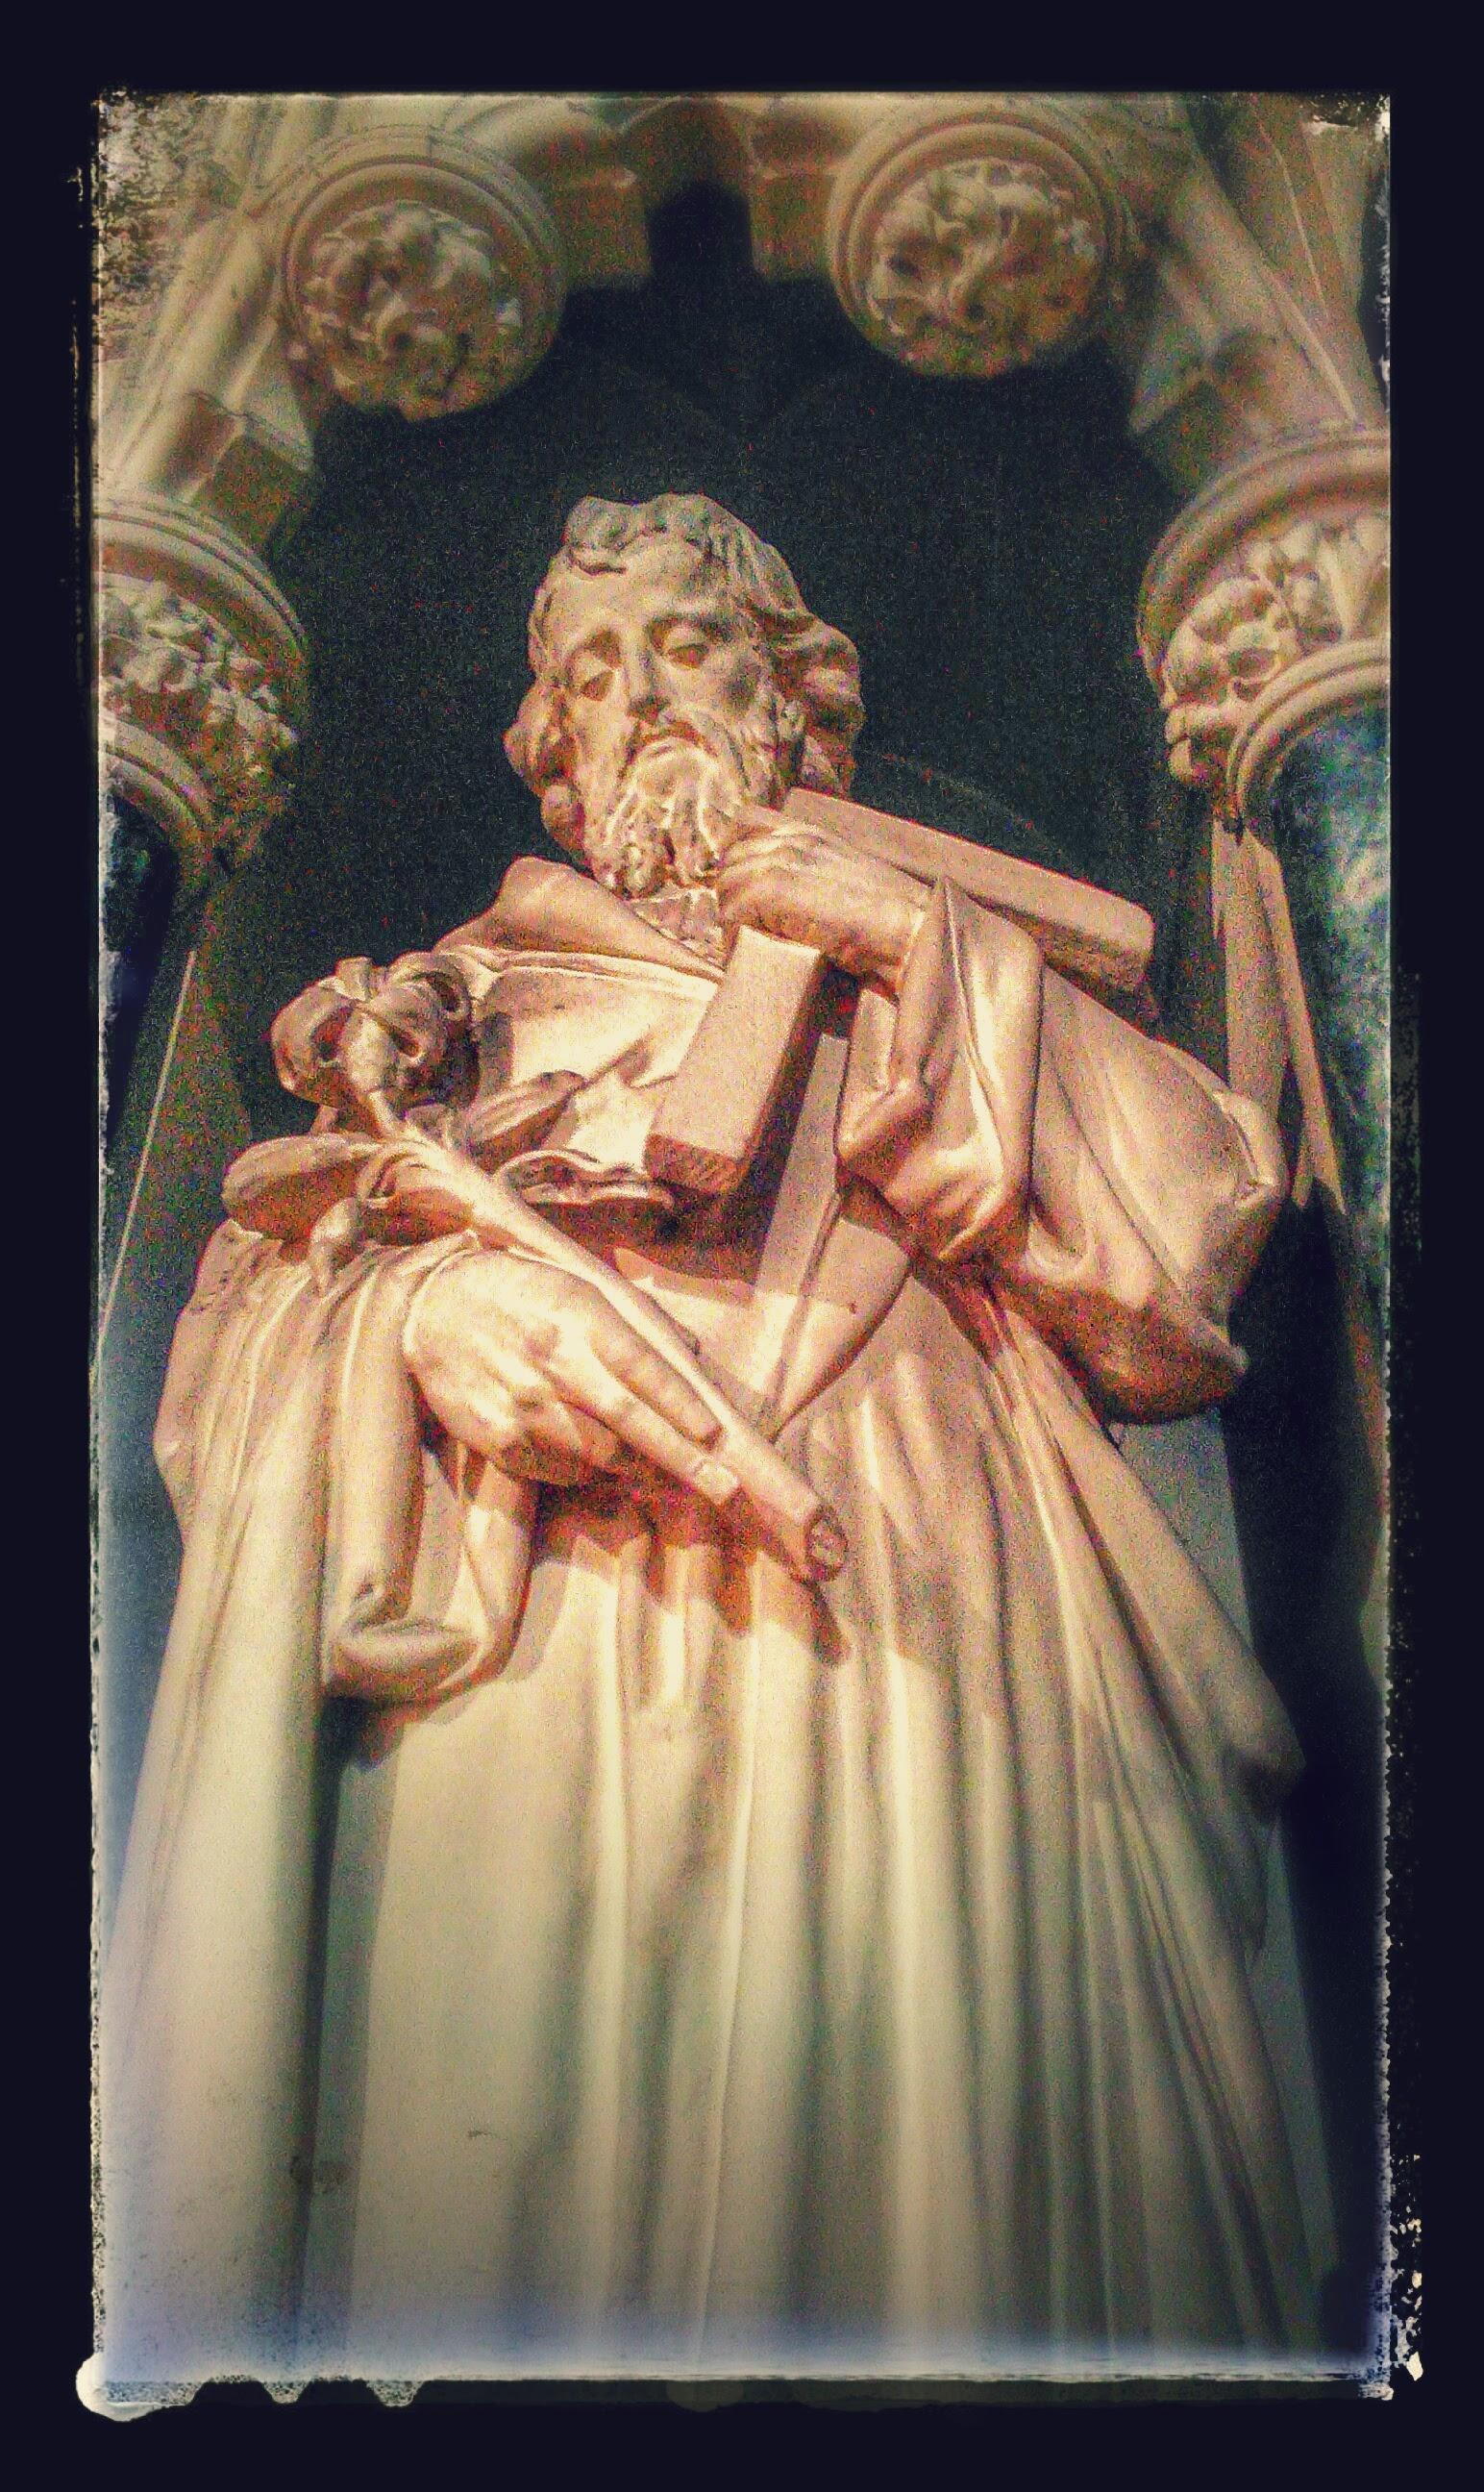 St Joseph, patron of the parish